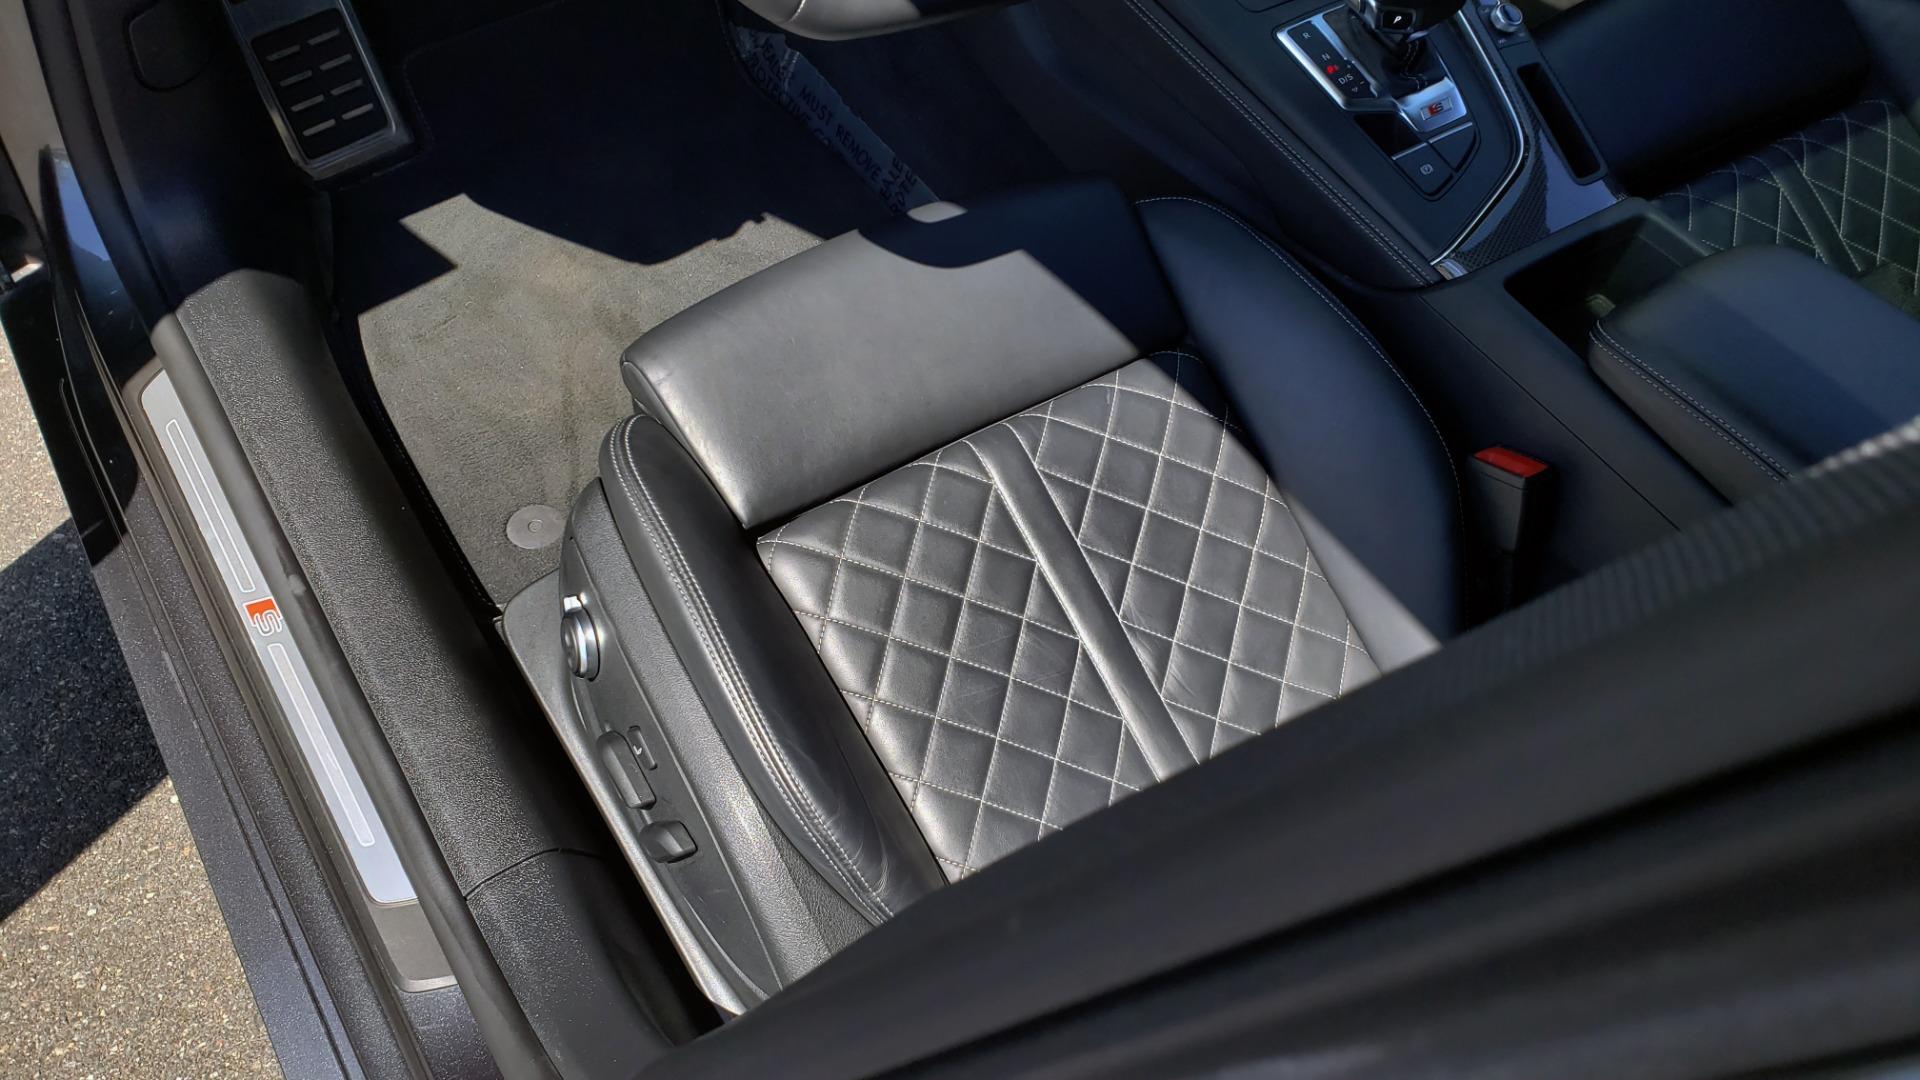 Used 2018 Audi S5 SPORTBACK PRESTIGE S-SPORT / NAV / SUNROOF / HUD / B&O SND / REARVIEW for sale $48,995 at Formula Imports in Charlotte NC 28227 32